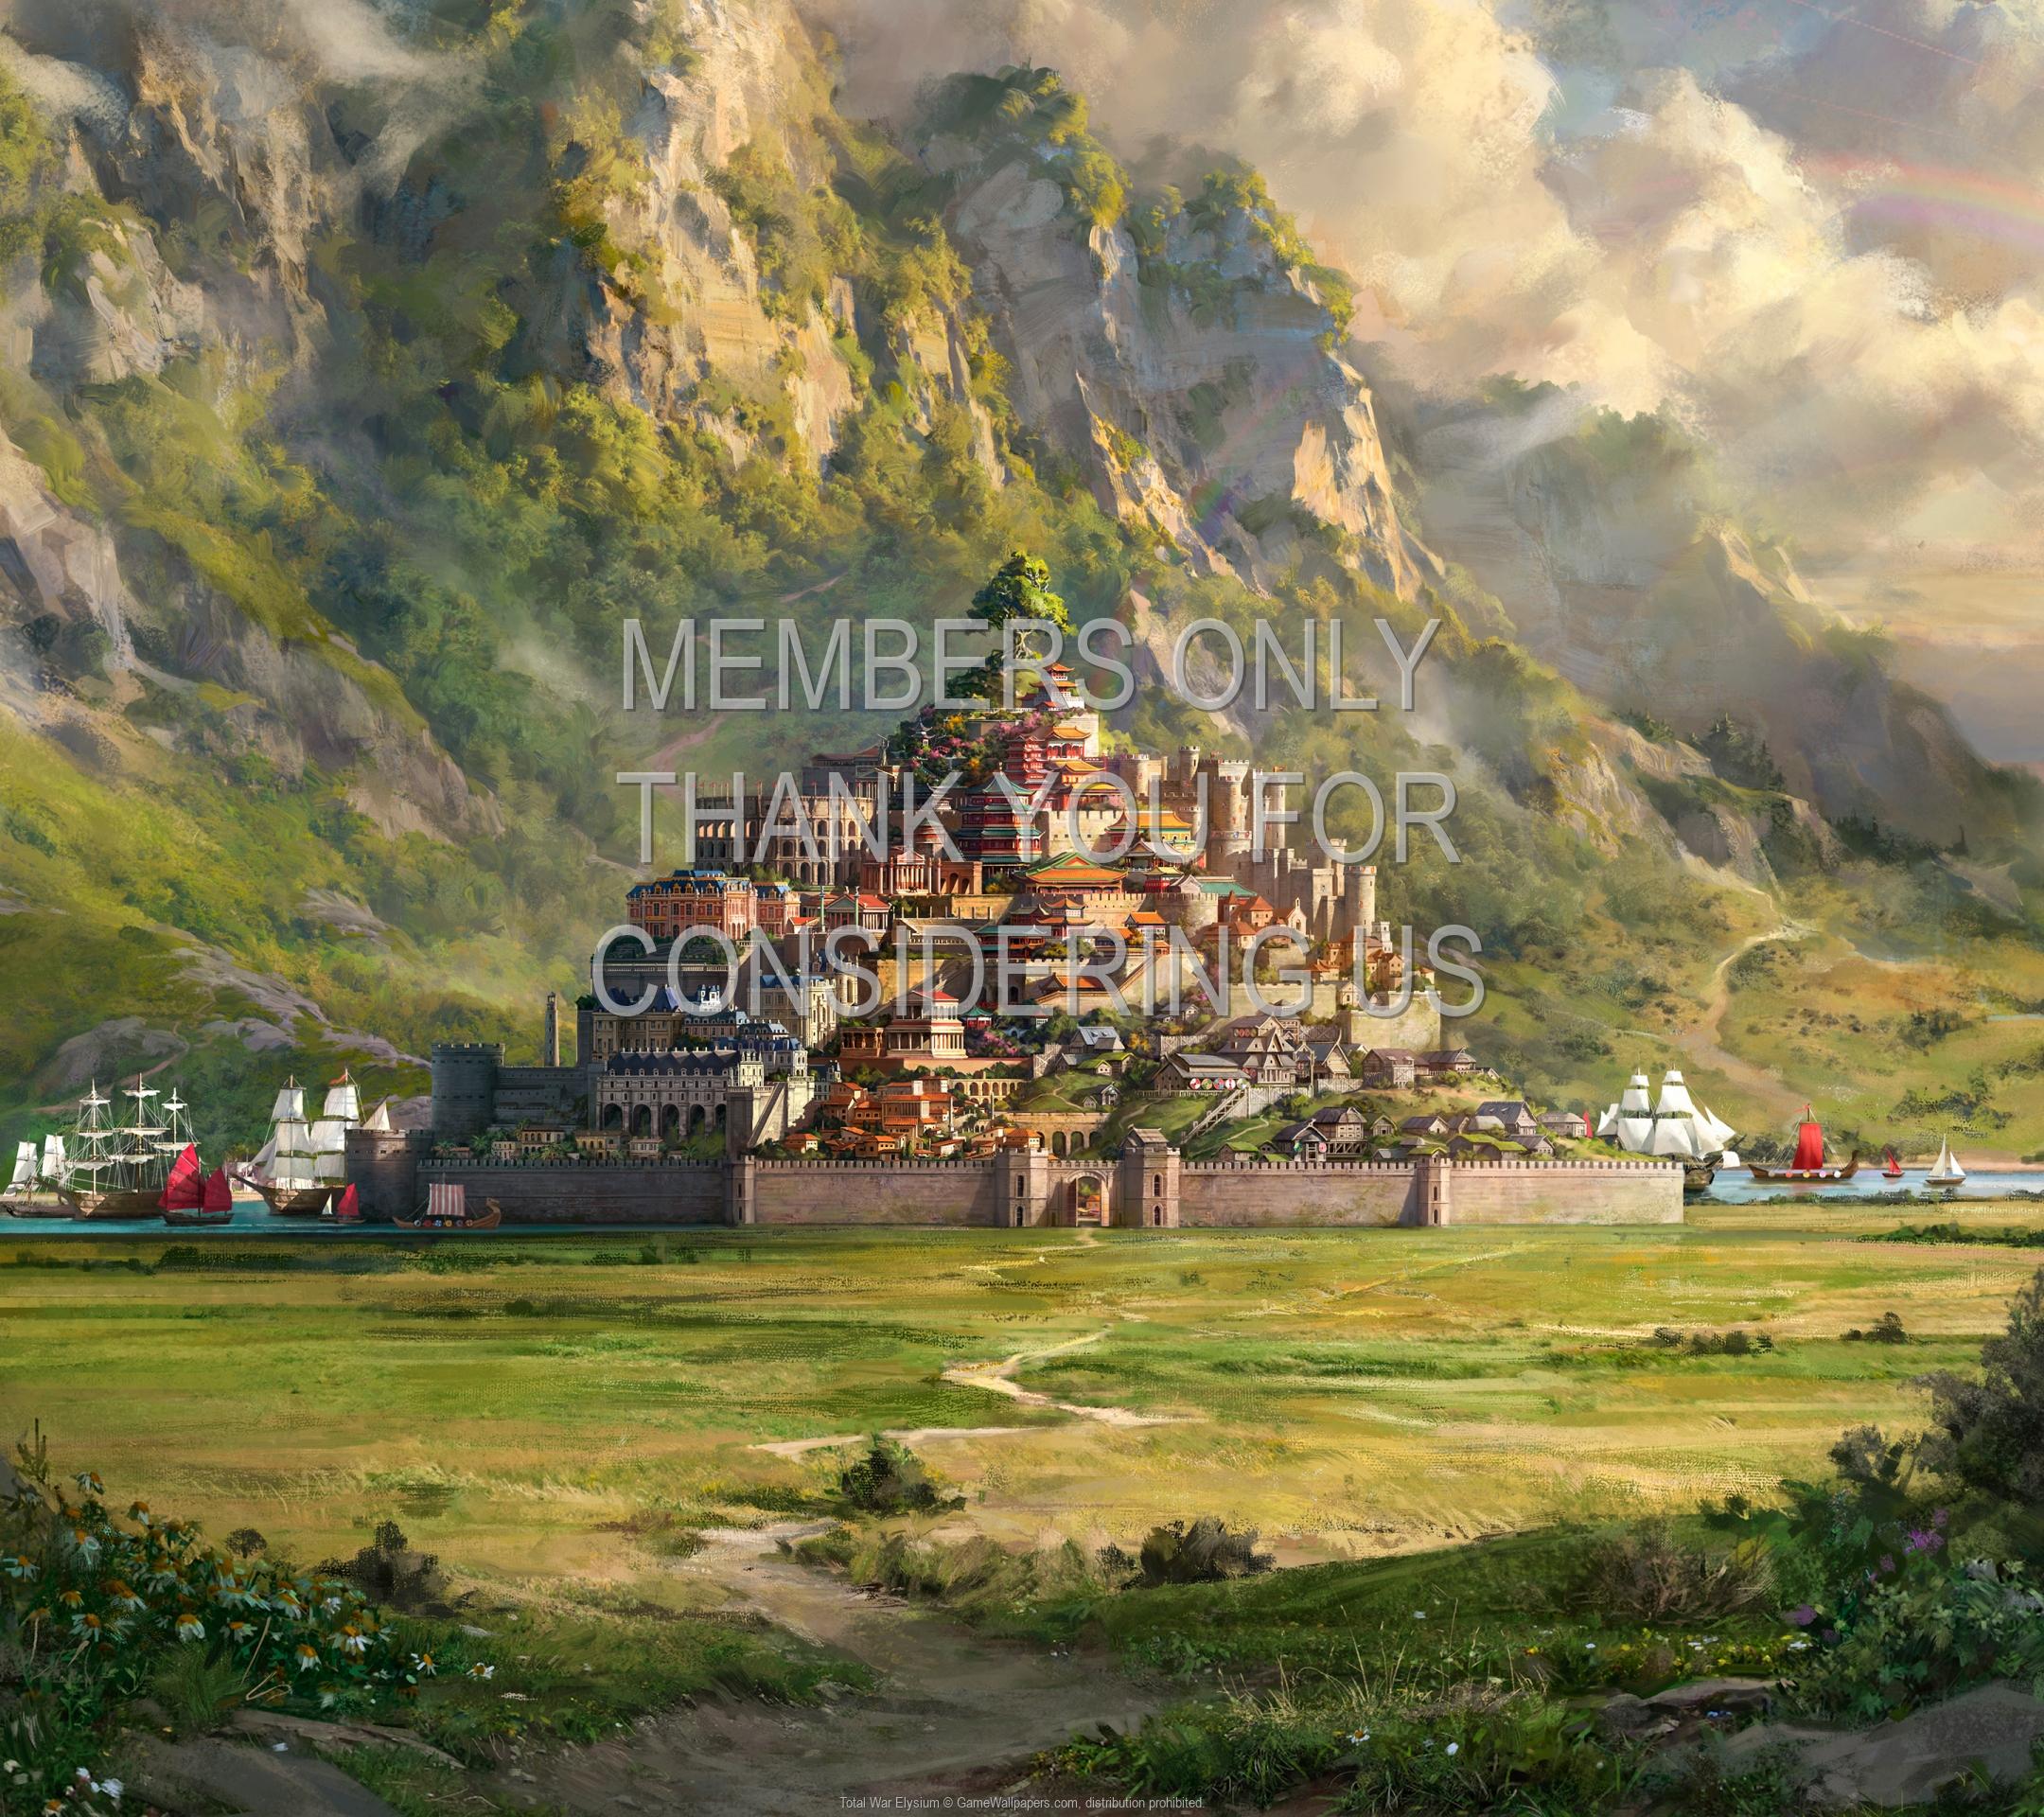 Total War: Elysium 1920x1080 Mobile wallpaper or background 02